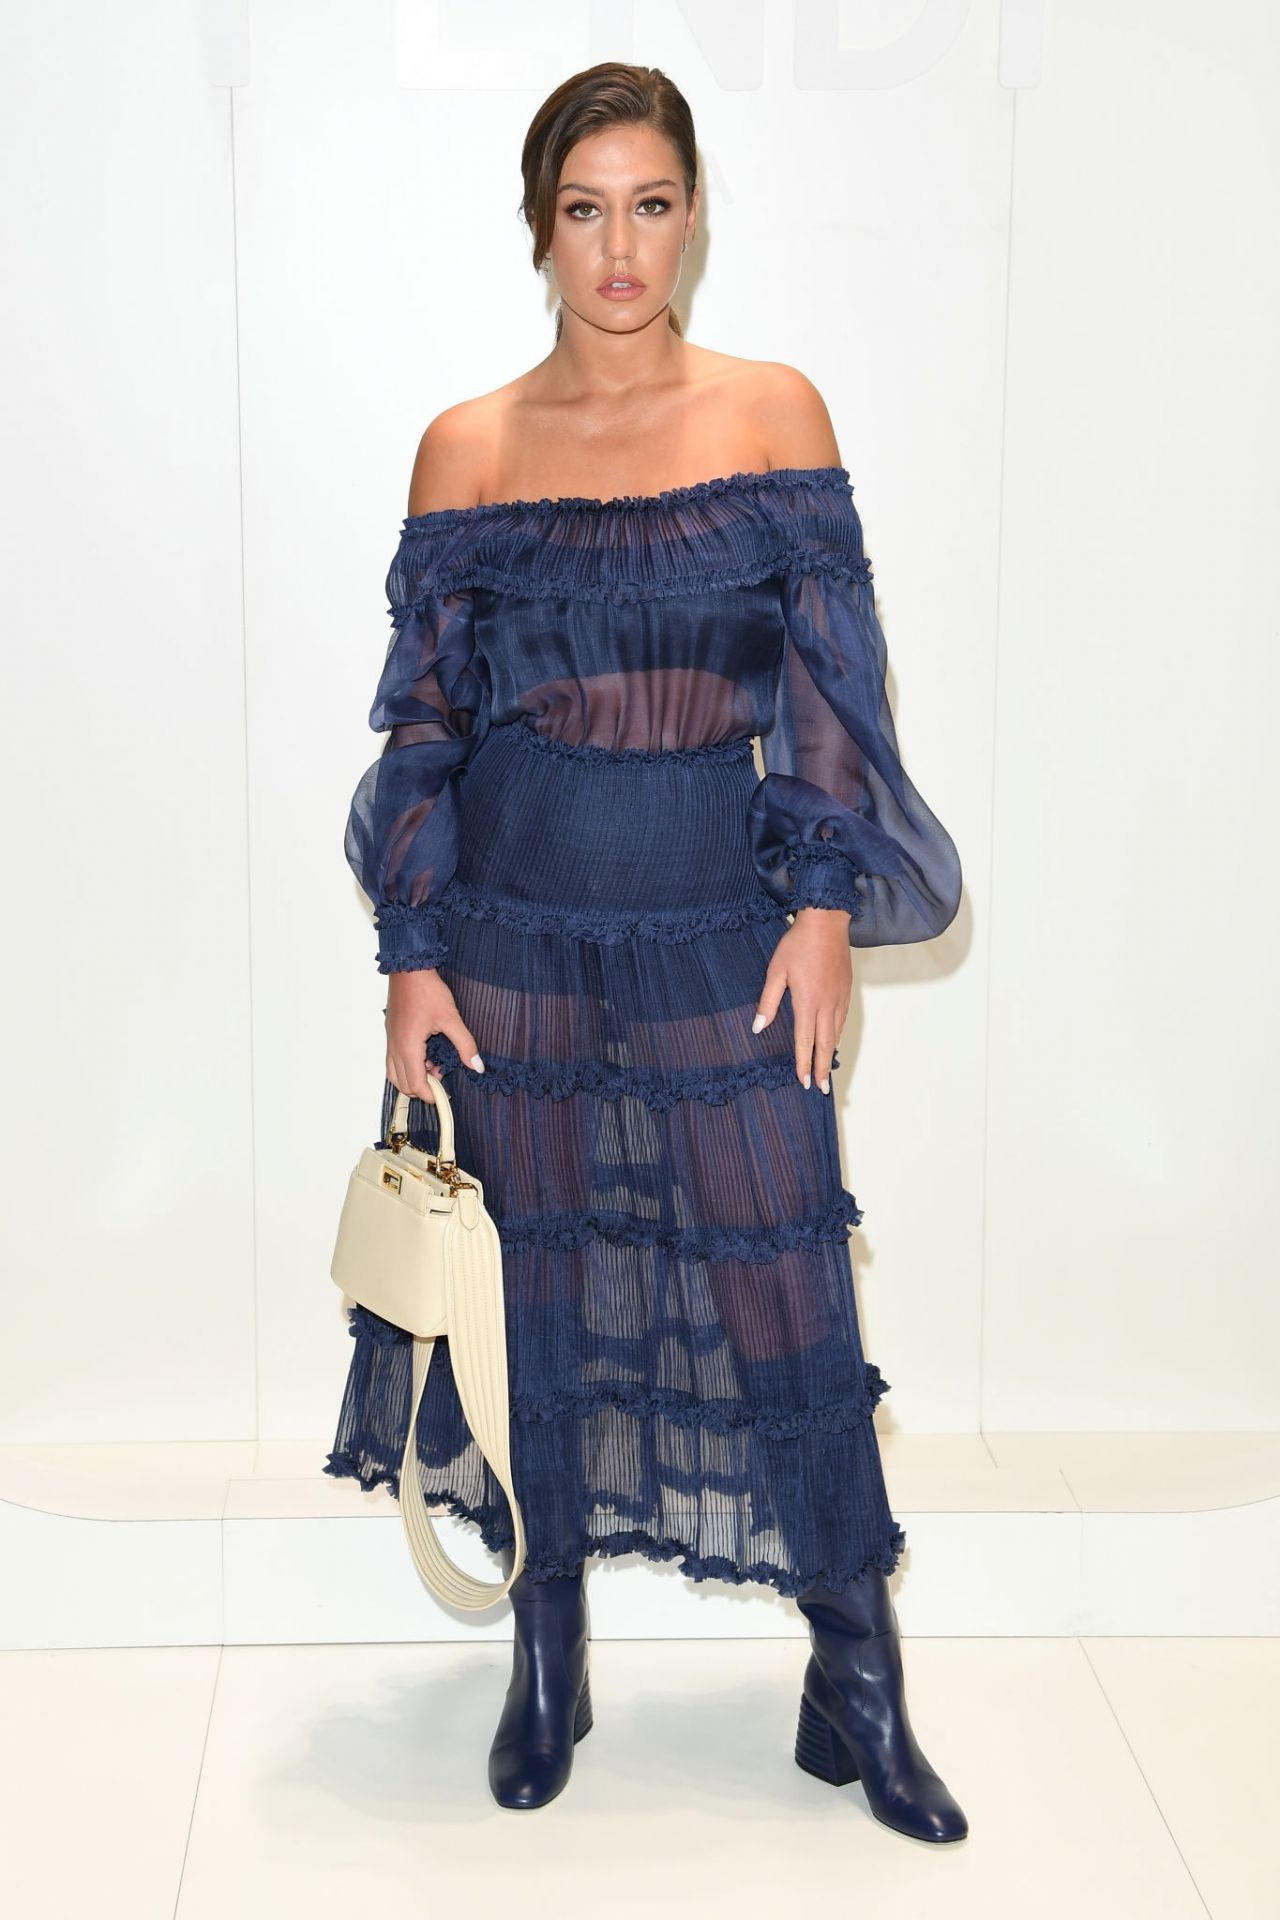 adele-exarchopoulos-front-row-fendi-fashion-show-in-milan